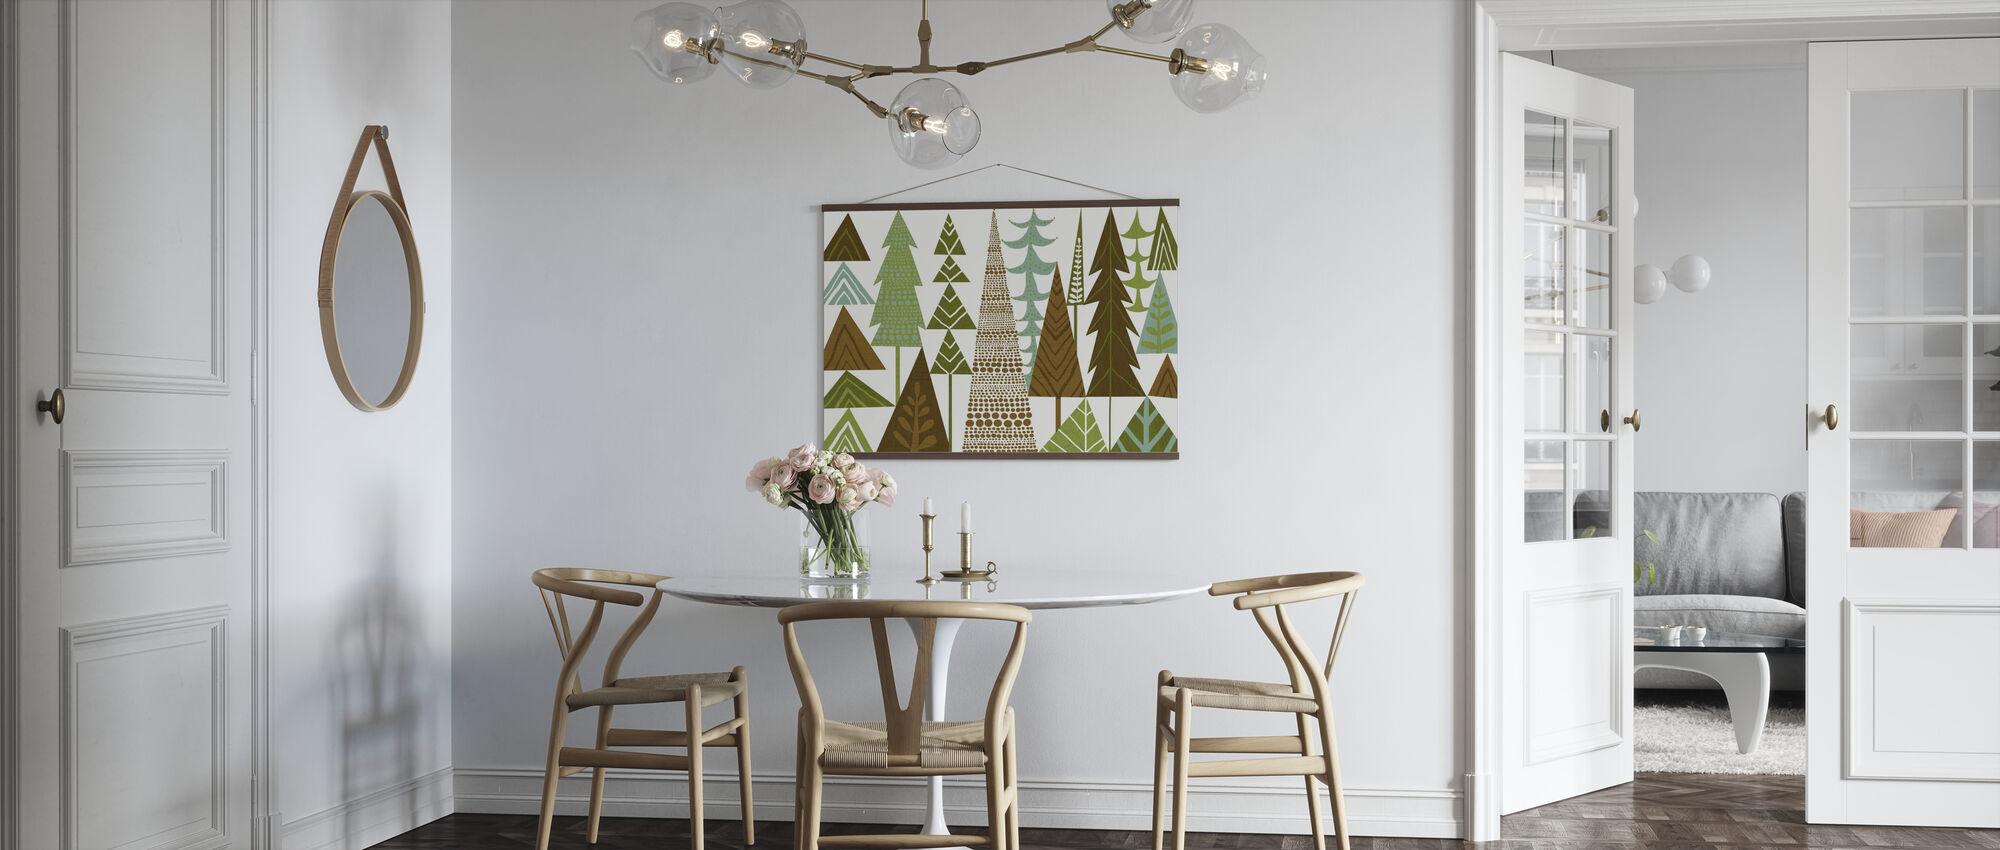 Folklore forestier arbres verts - Affiche - Cuisine